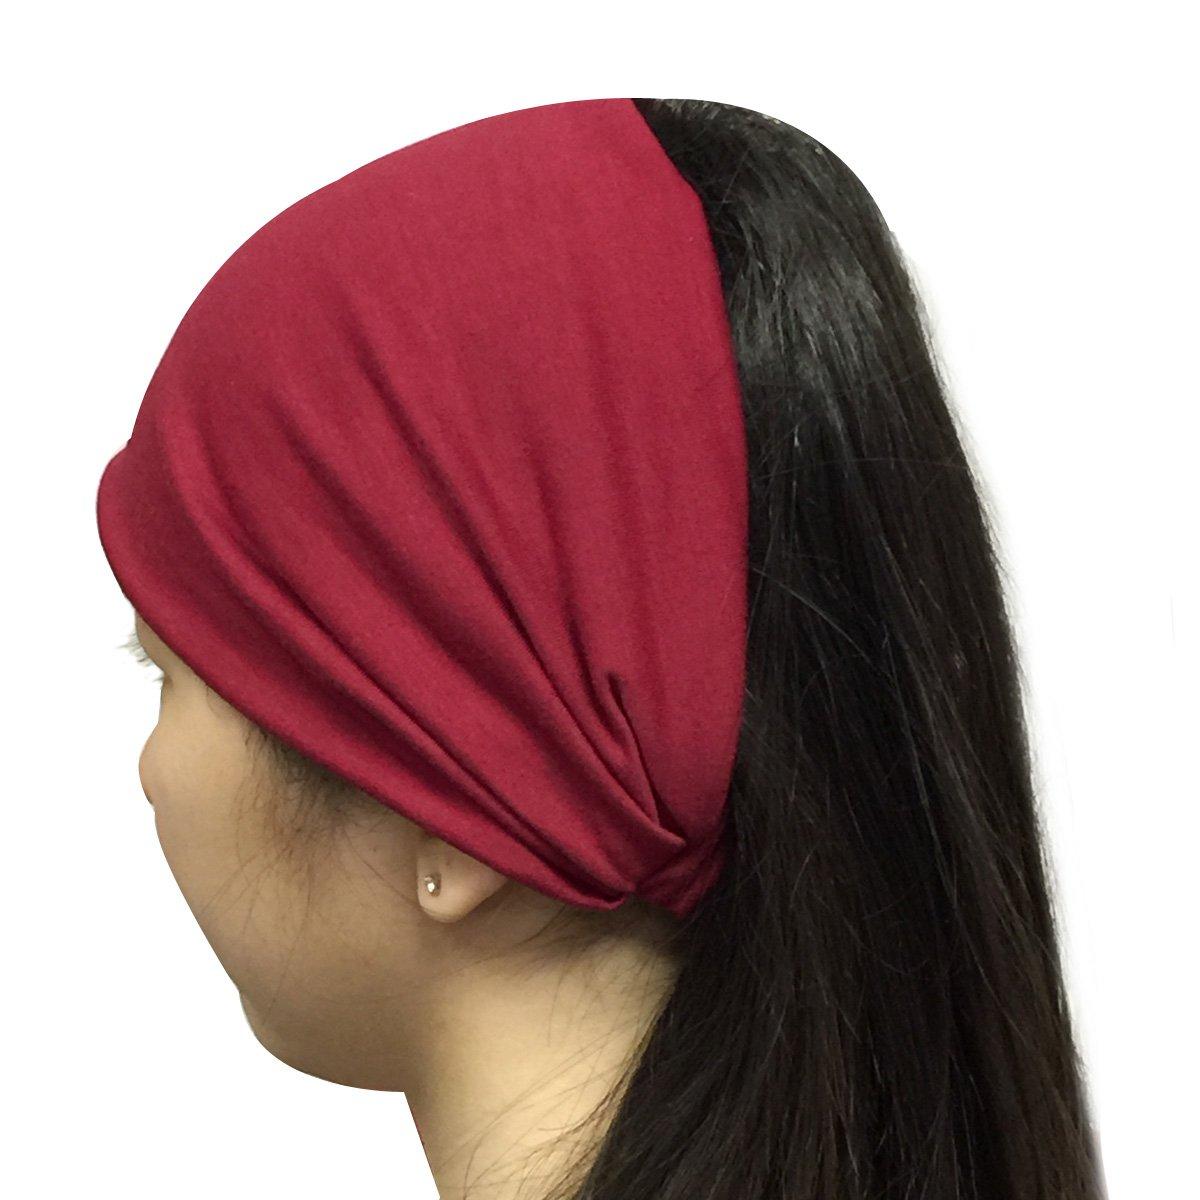 Wrapables Wide Fabric Headband, Burgundy